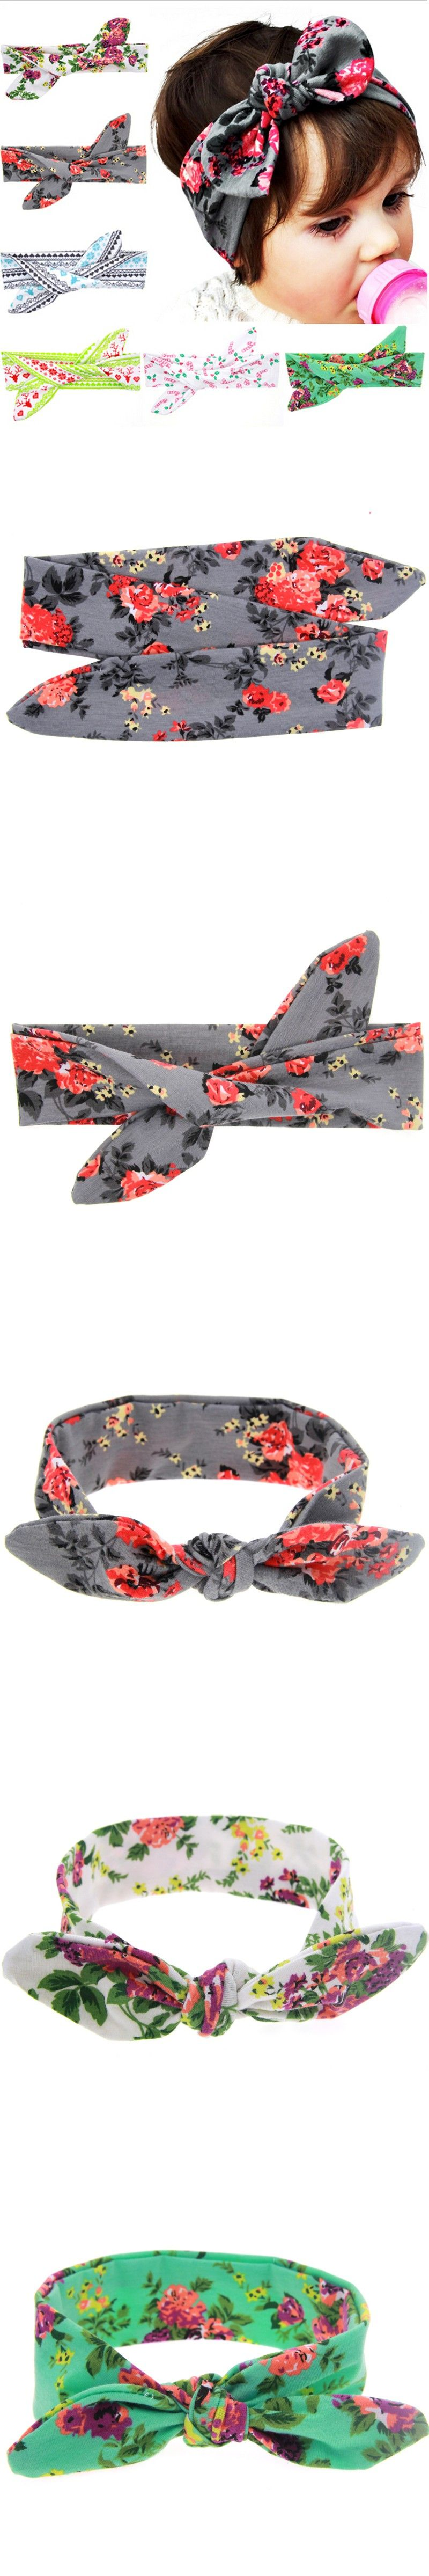 Zara baby hair accessories - Diy Free Size Baby Flower Headband Toddler Soft Girl Kids Cross Hairband Turban Knitte Knot Headwear